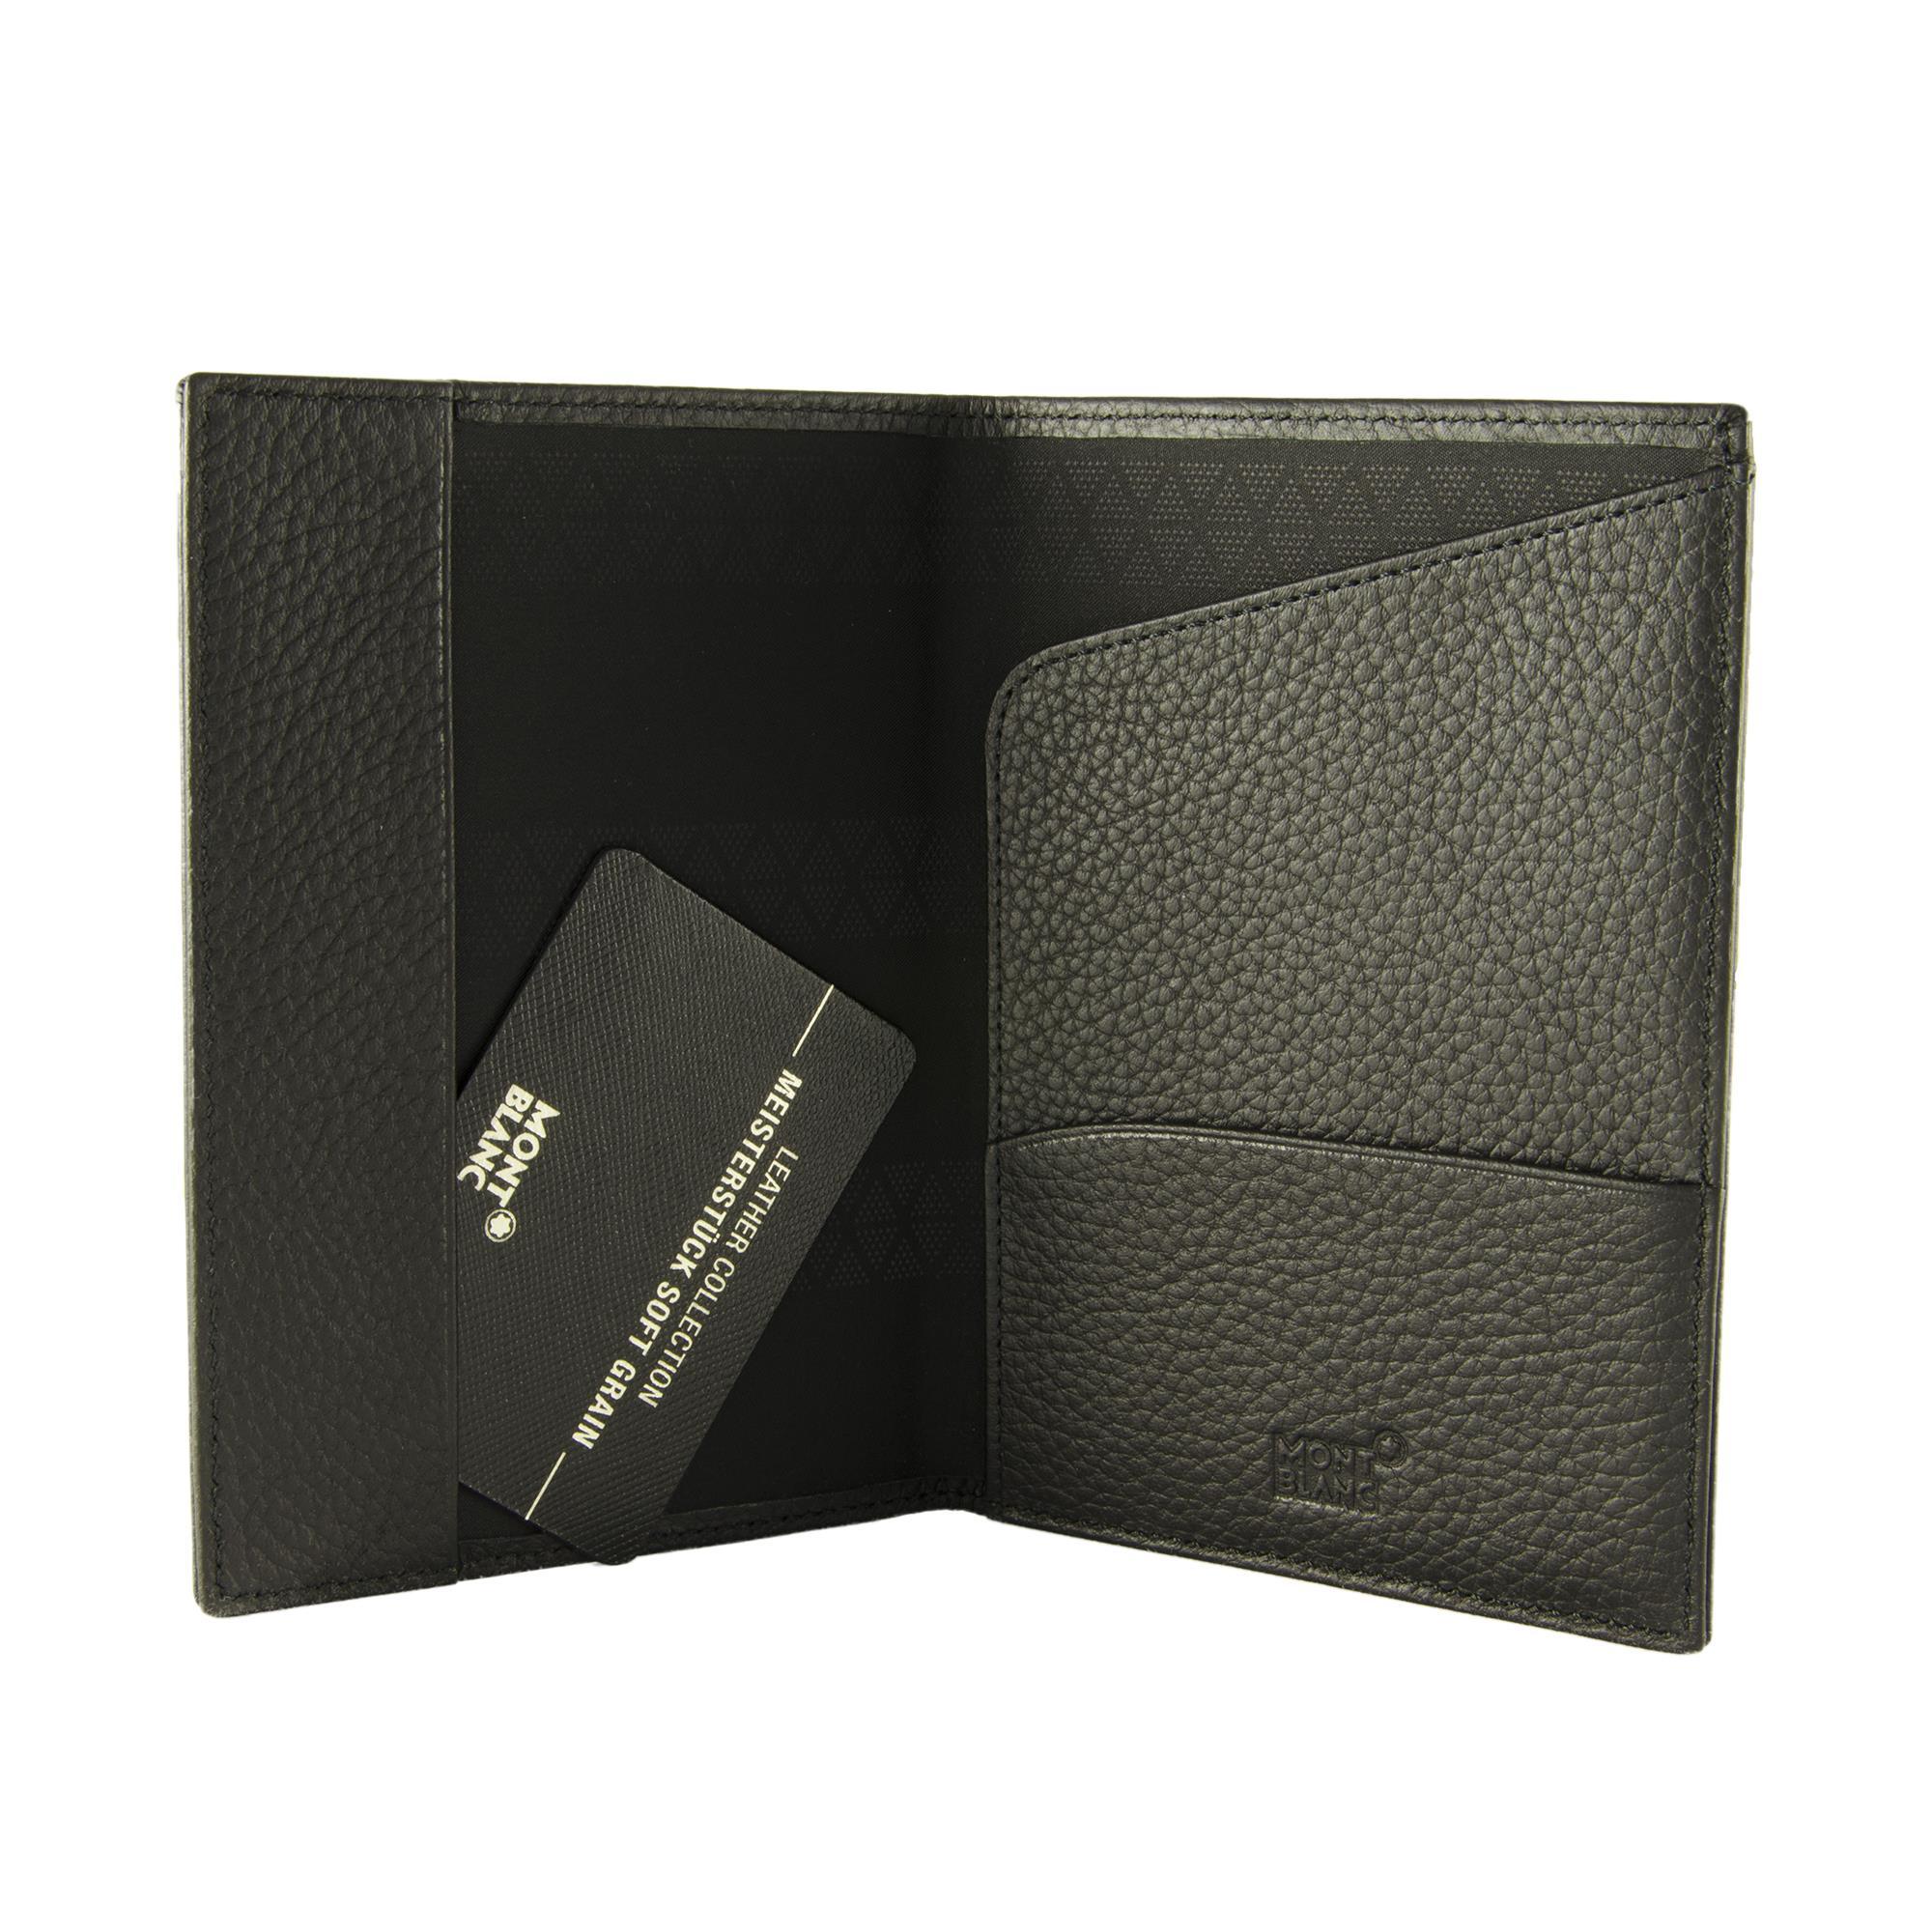 Porta Passaporto In Pelle Nera Montblanc Luxuryzone